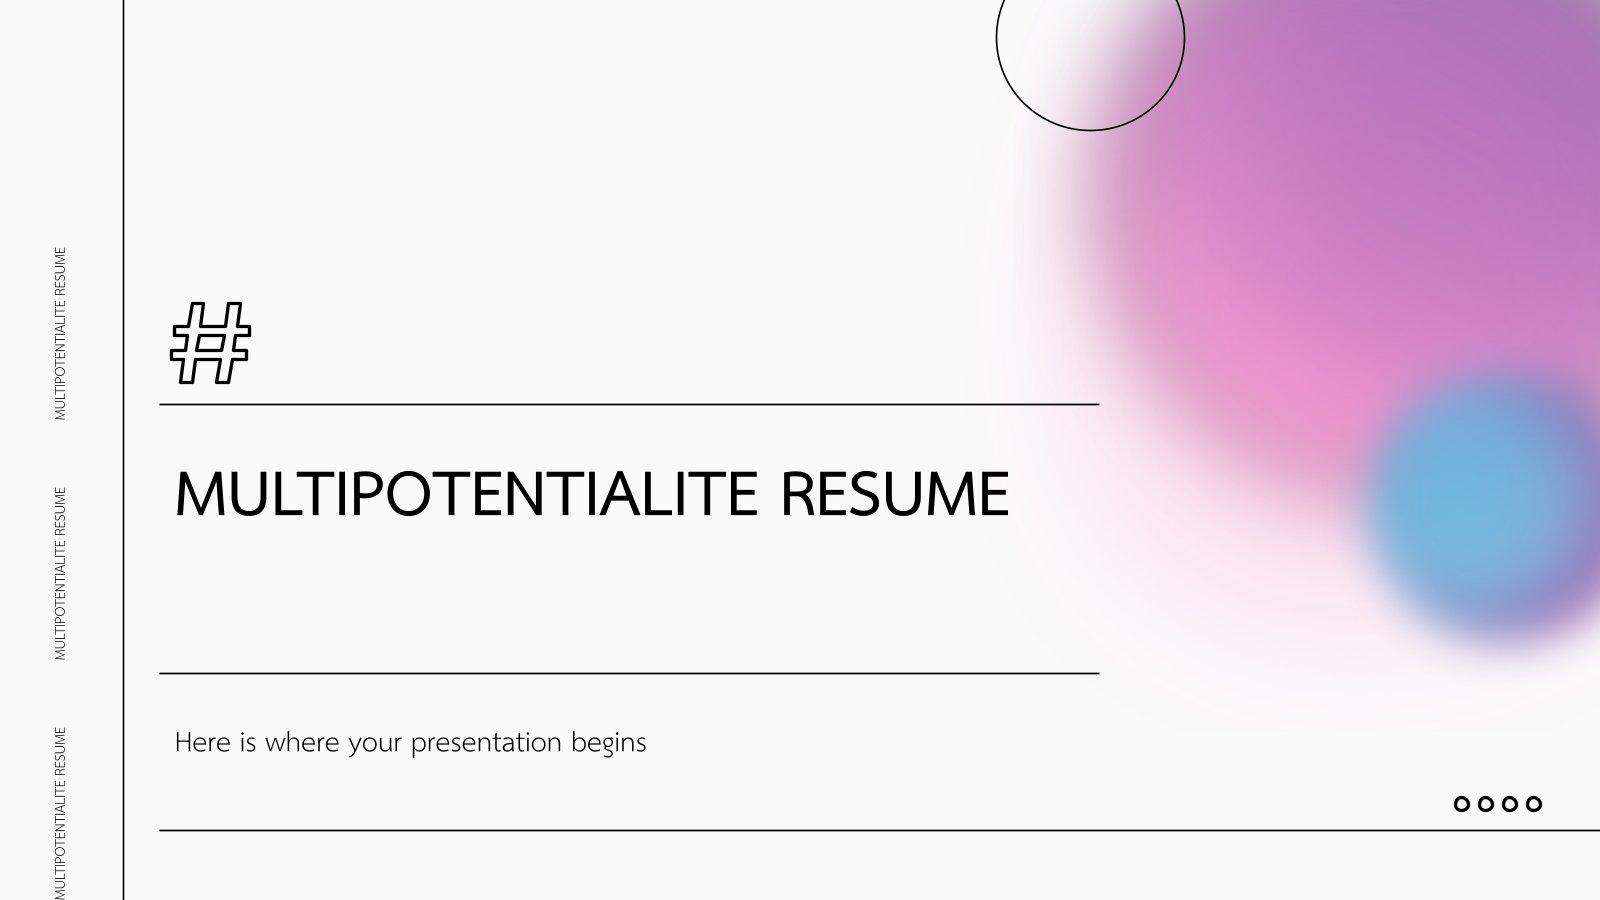 Multipotentialite Resume presentation template